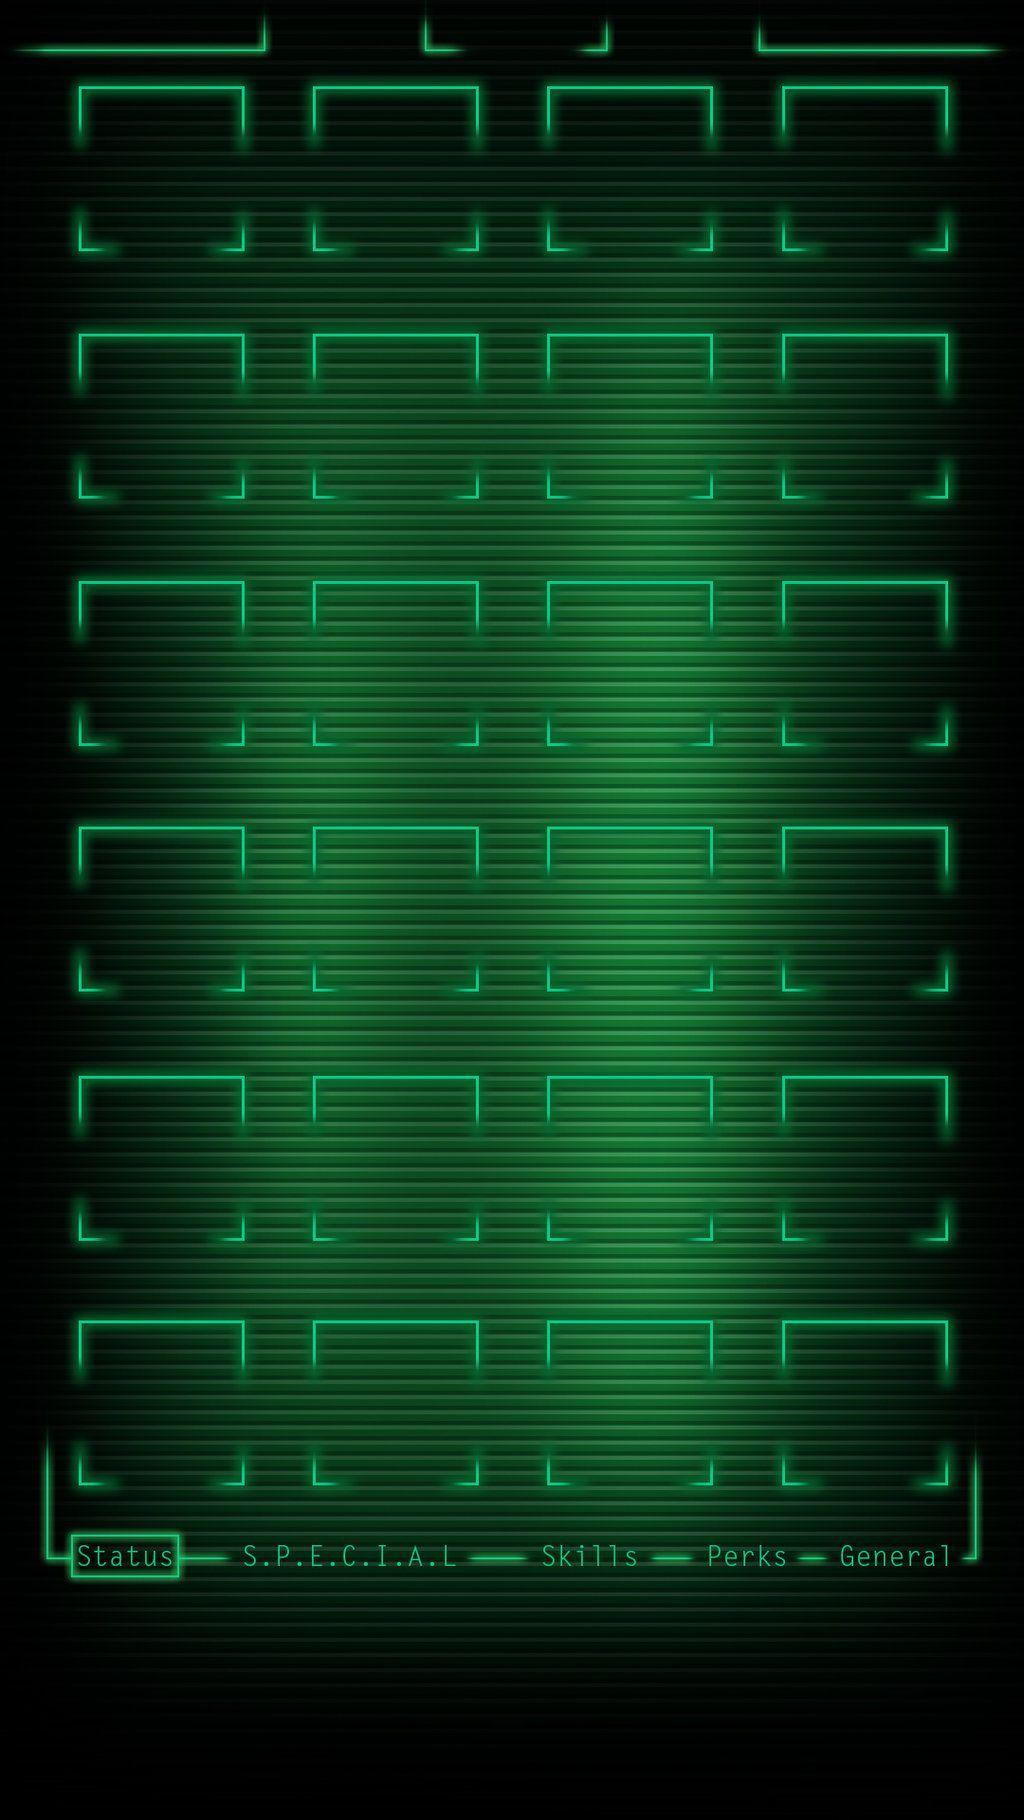 Iphone 6 Fallout Wallpaper Di 2021